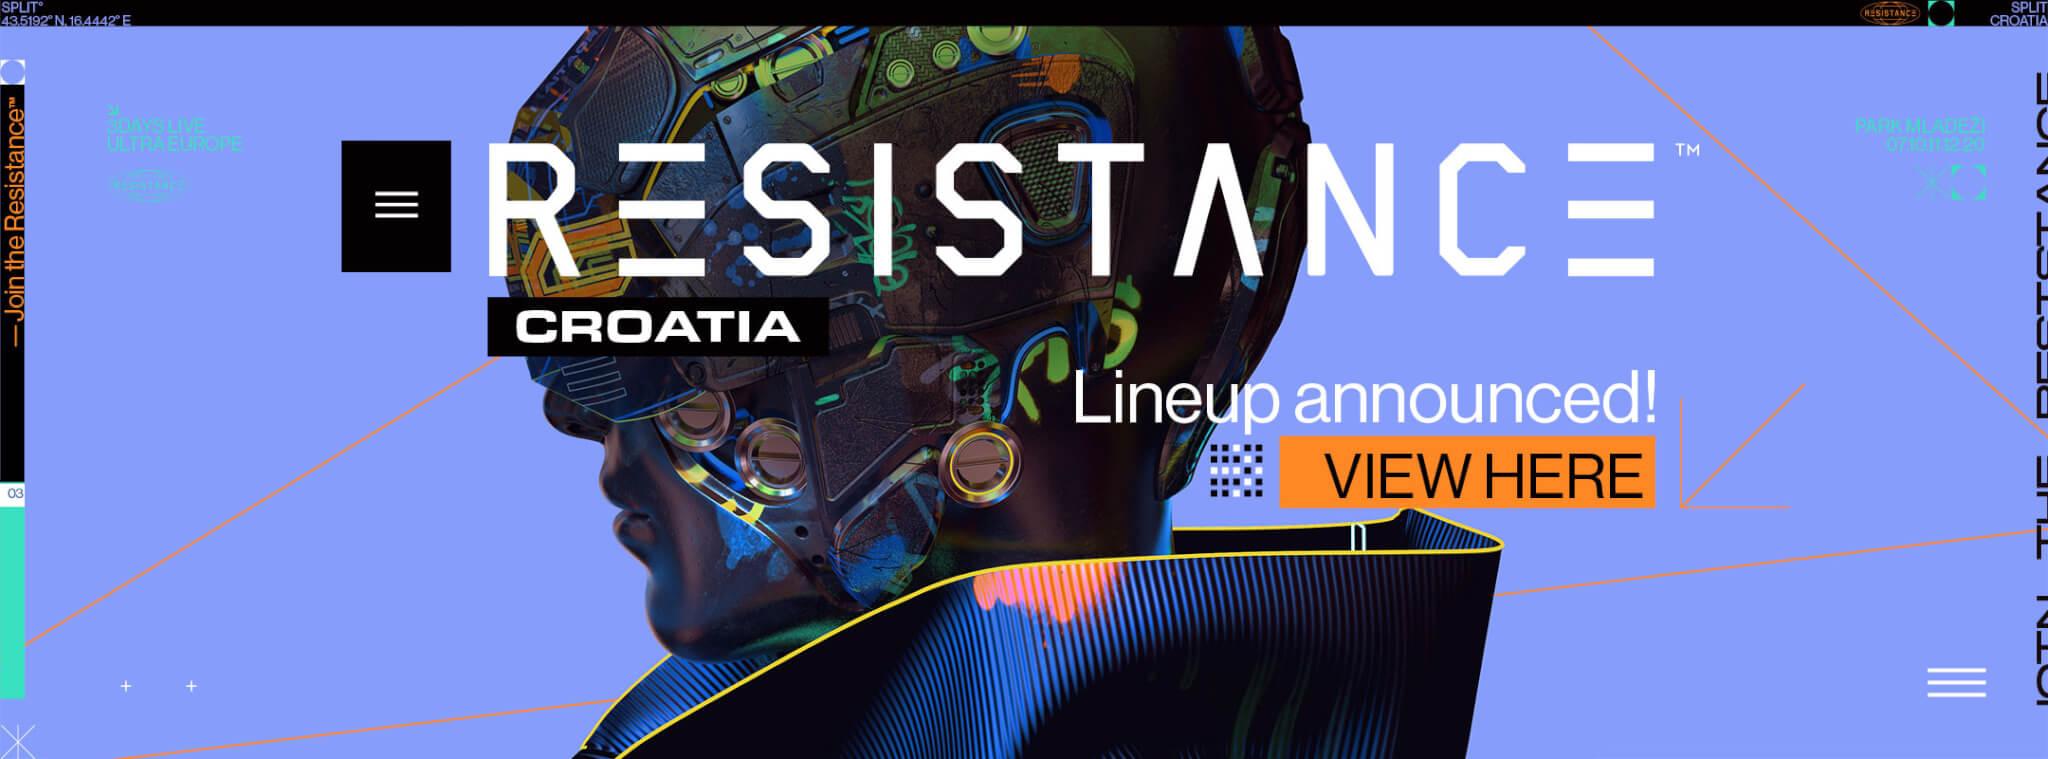 View the Resistance Croatia 2020 Lineup